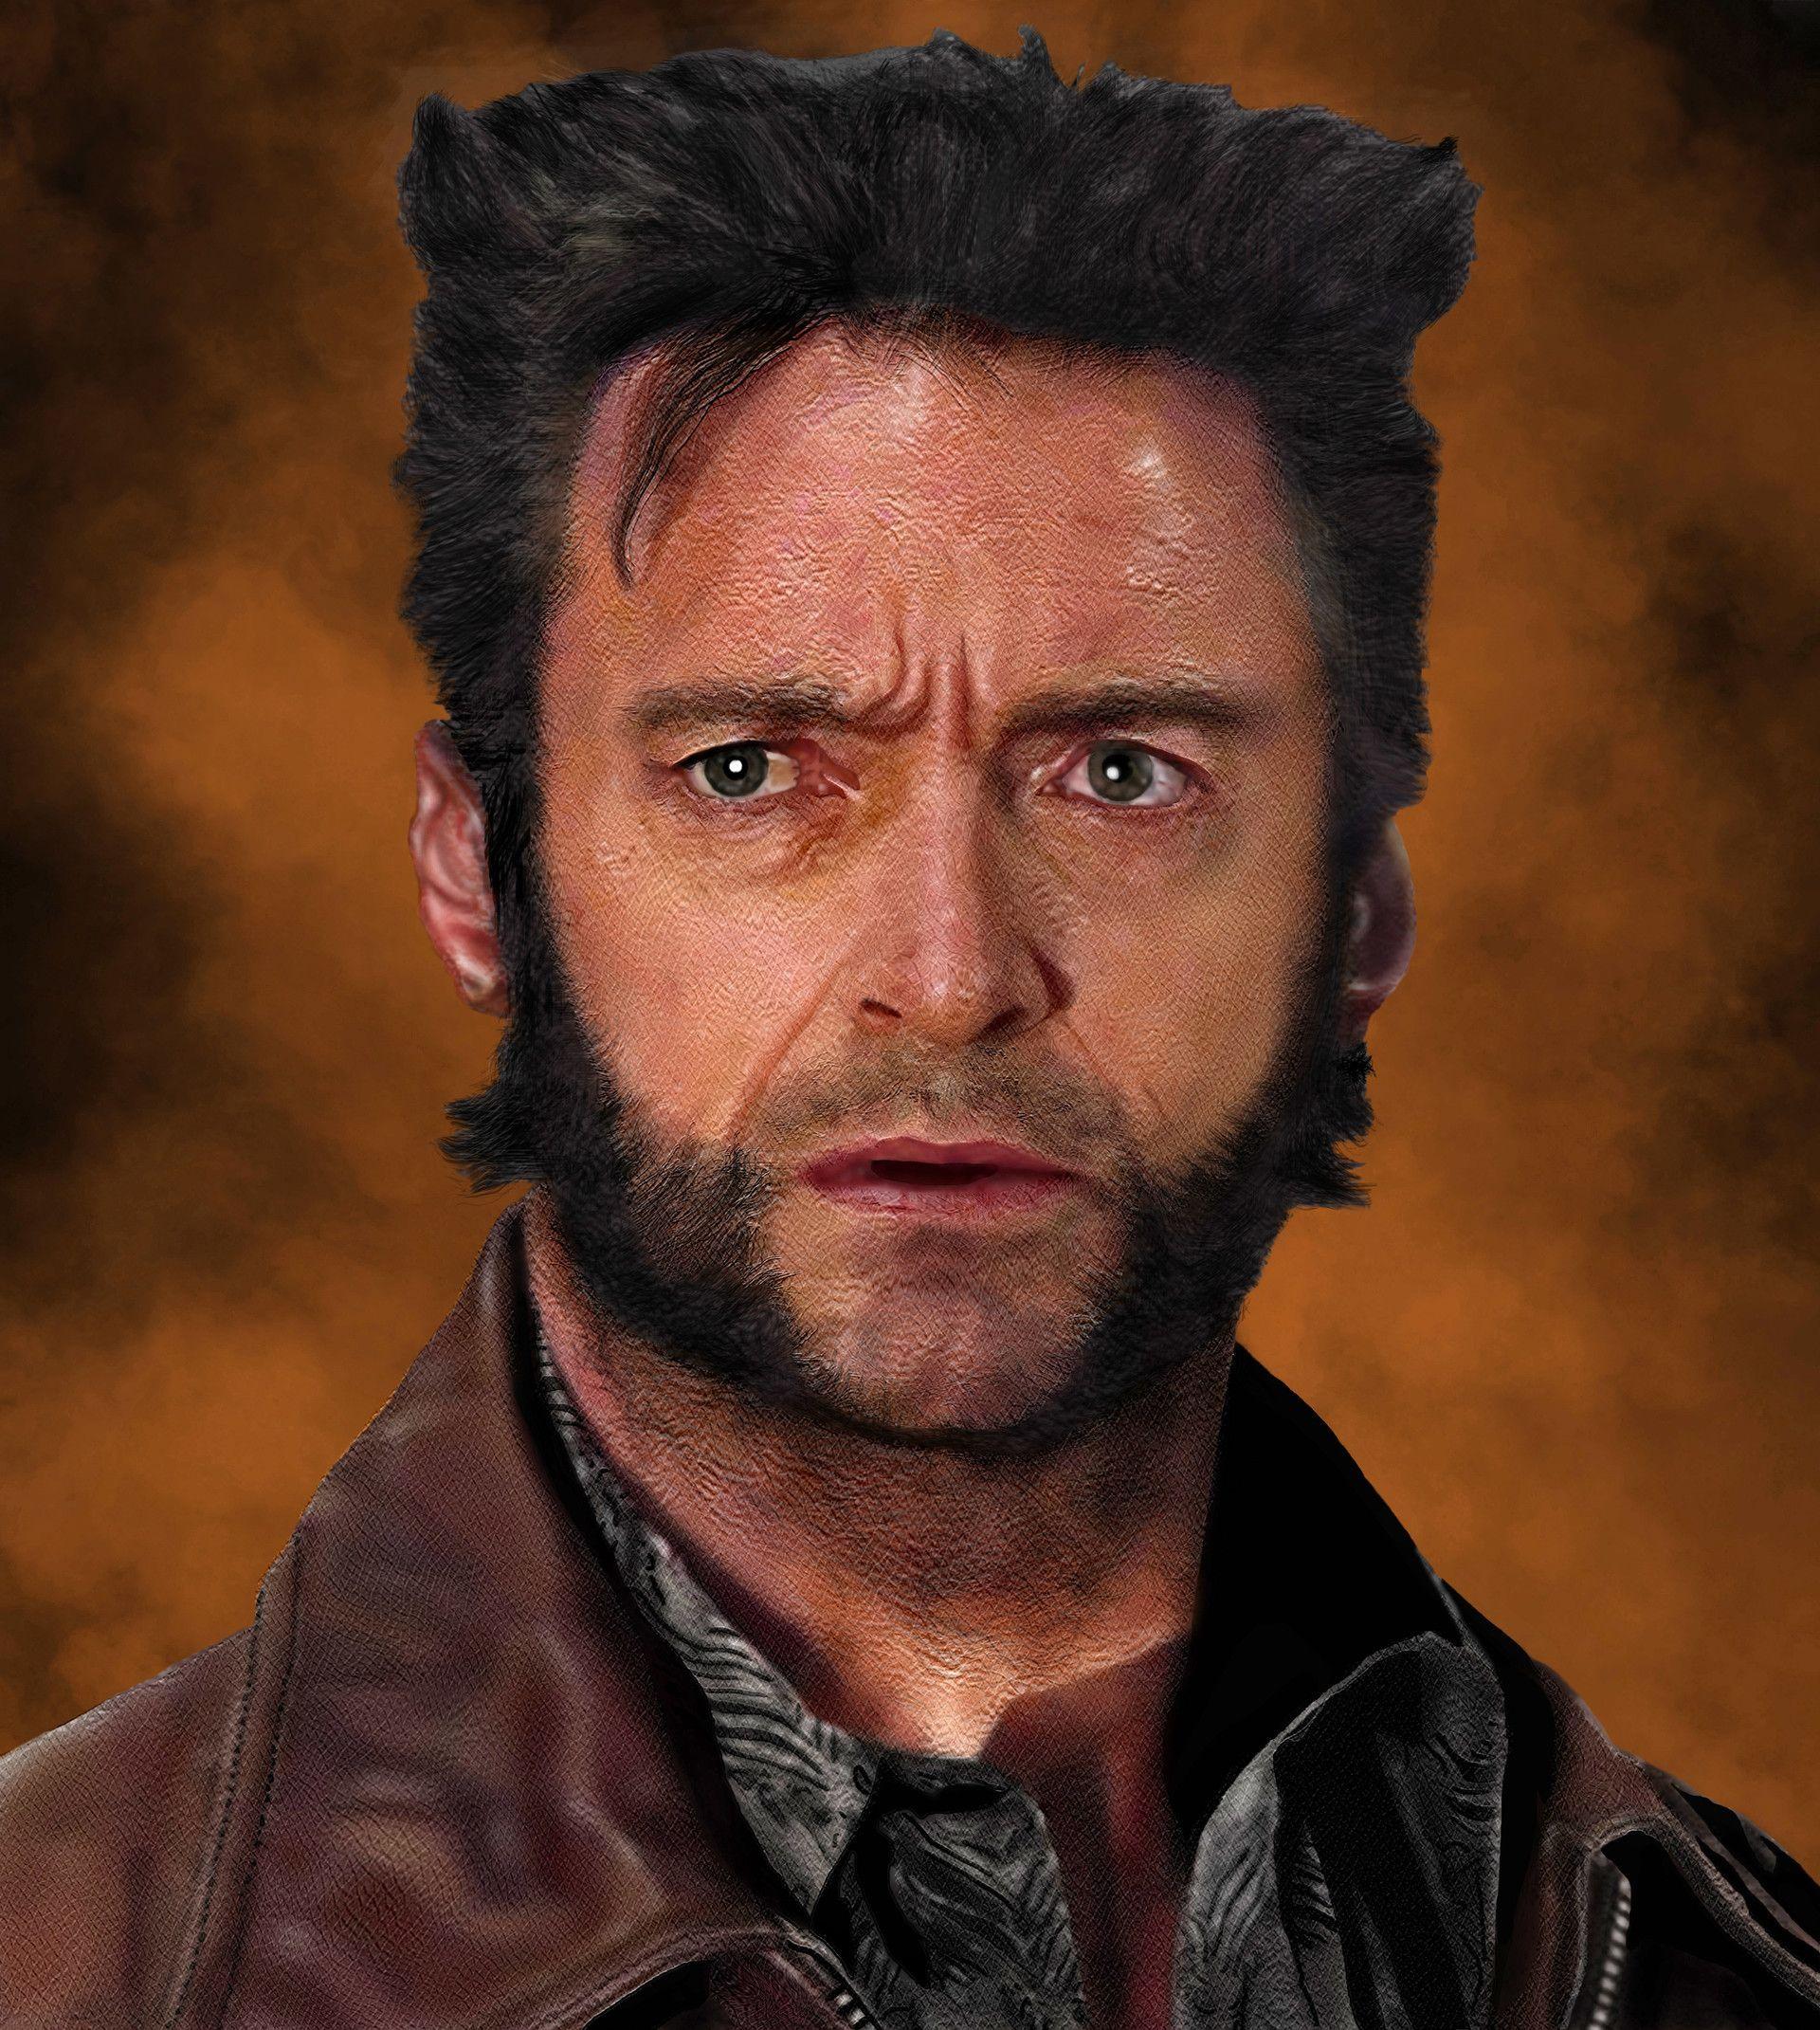 Artstation Wolverine Days Of Future Past Participant Of Cgtrader Awards Dima Nguyen Wolverine Hair Wolverine Hugh Jackman Wolverine